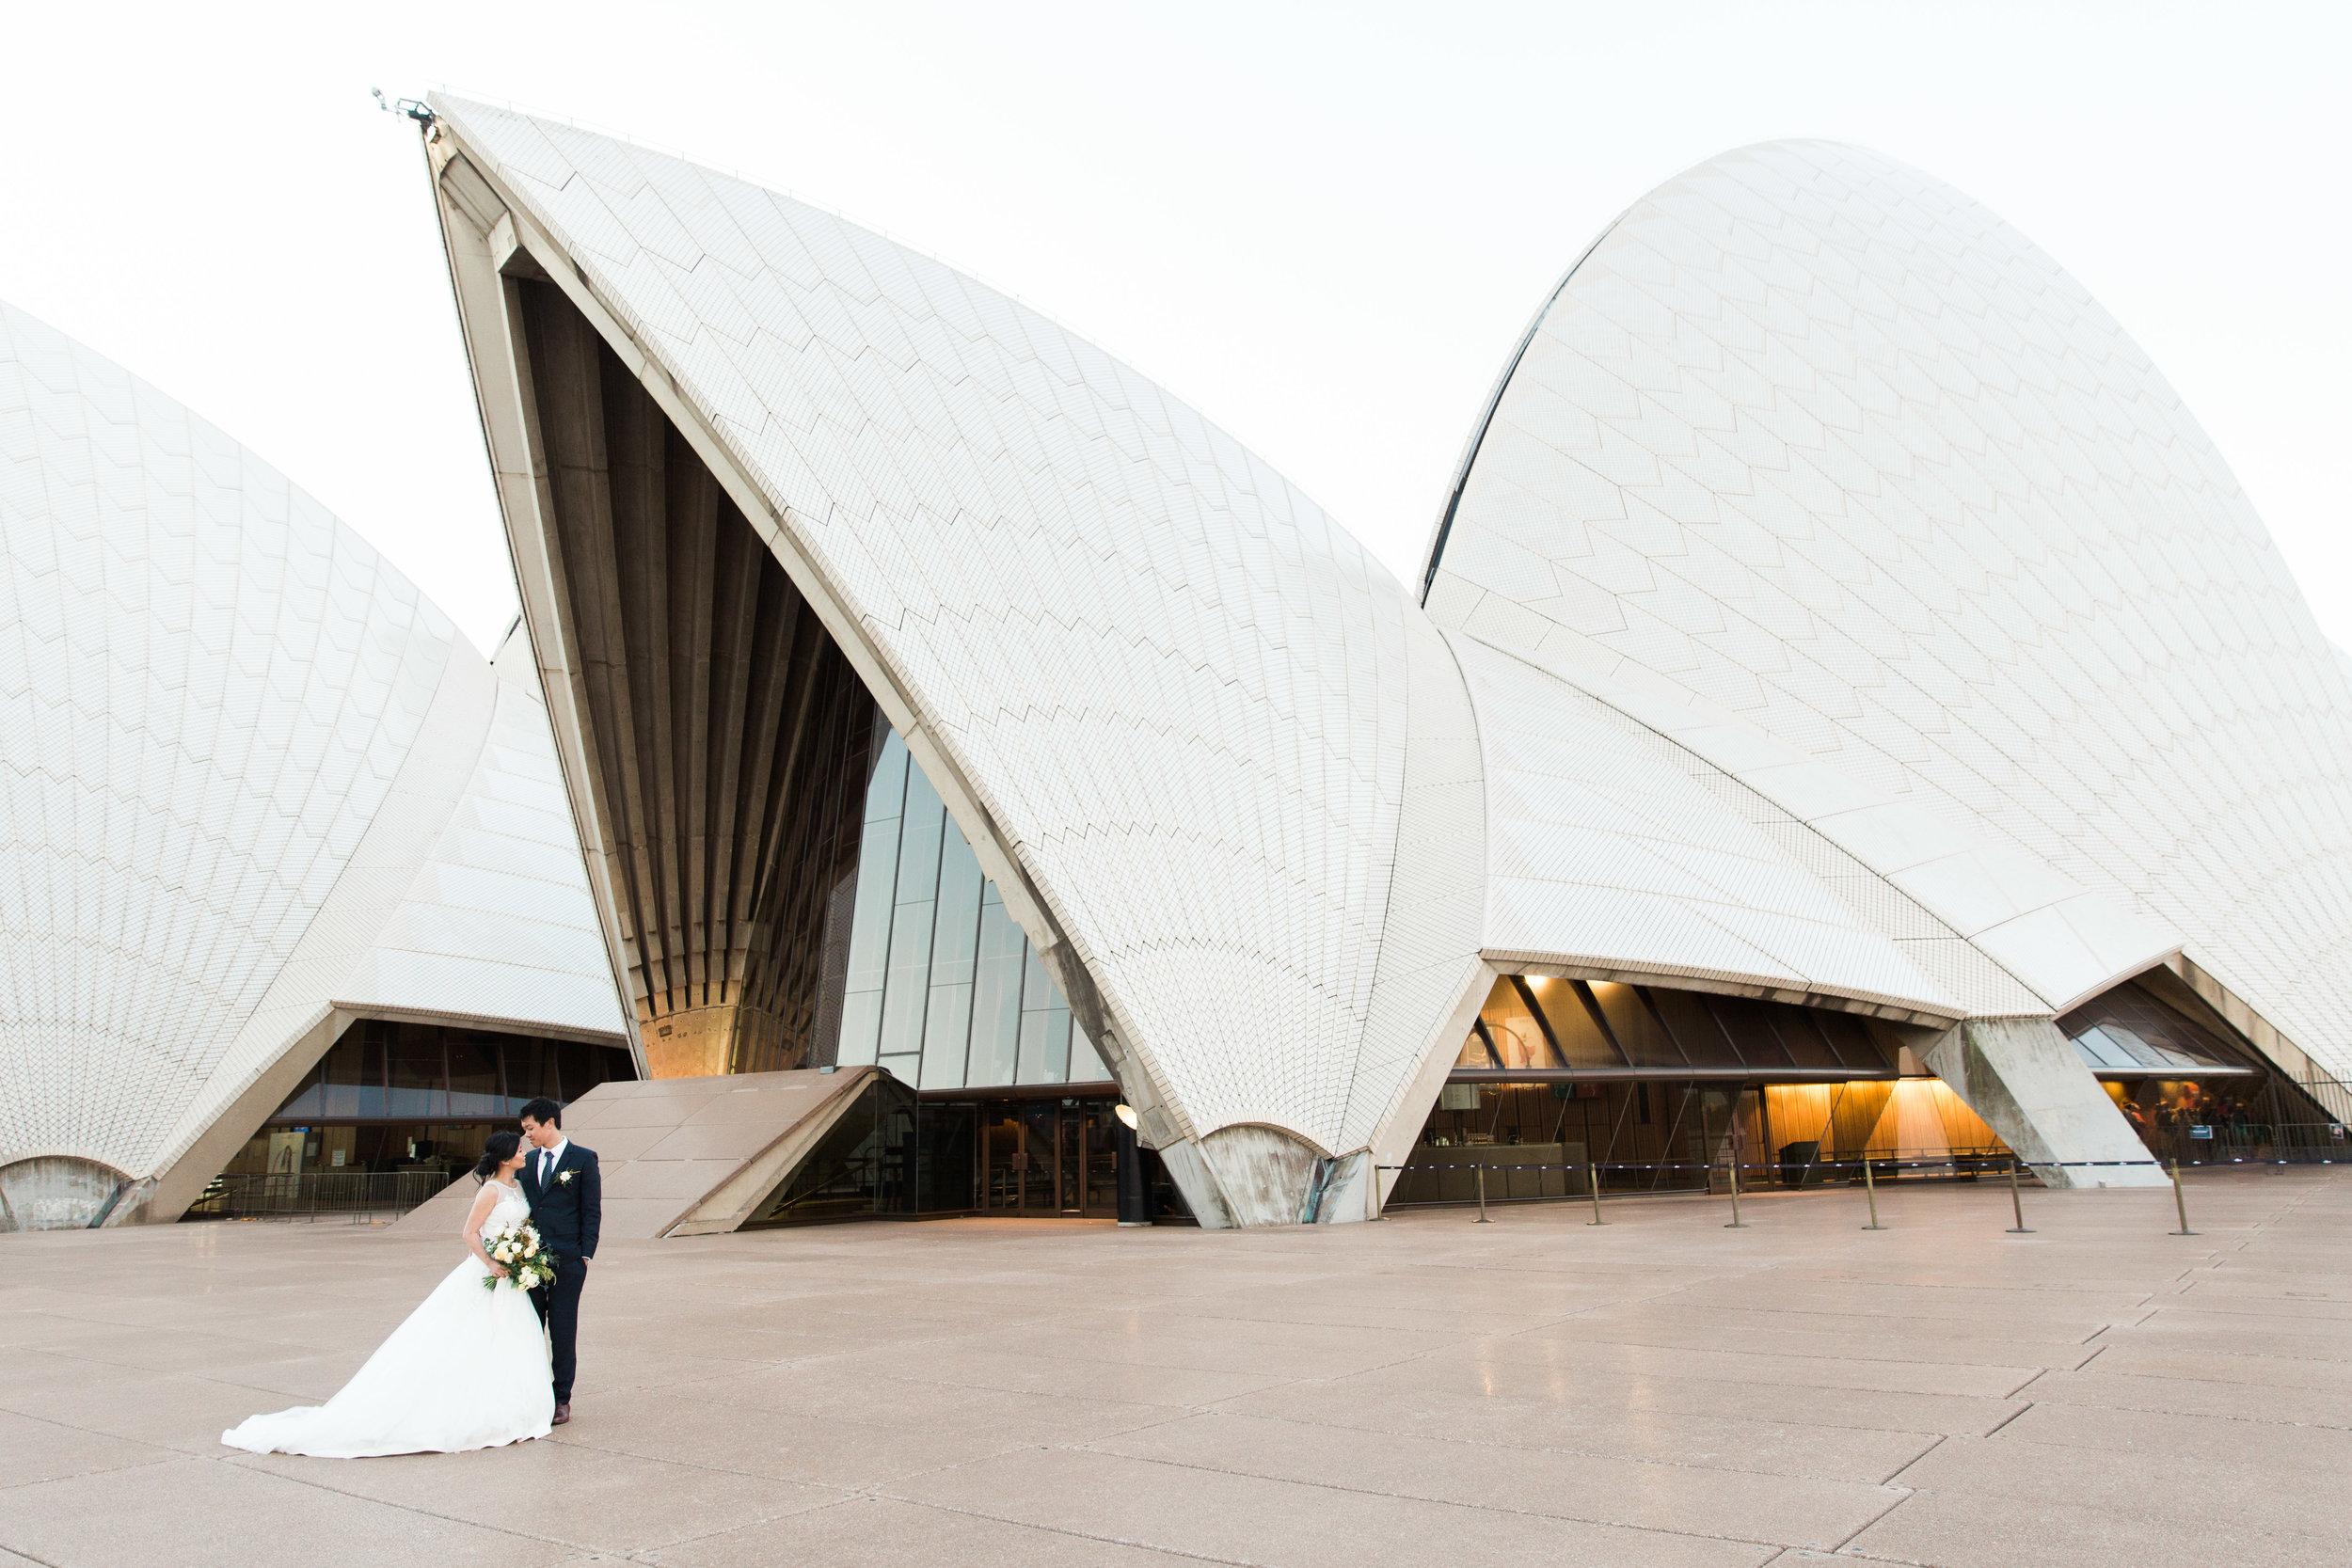 00047- Australia Sydney Wedding Photographer Sheri McMahon.jpg